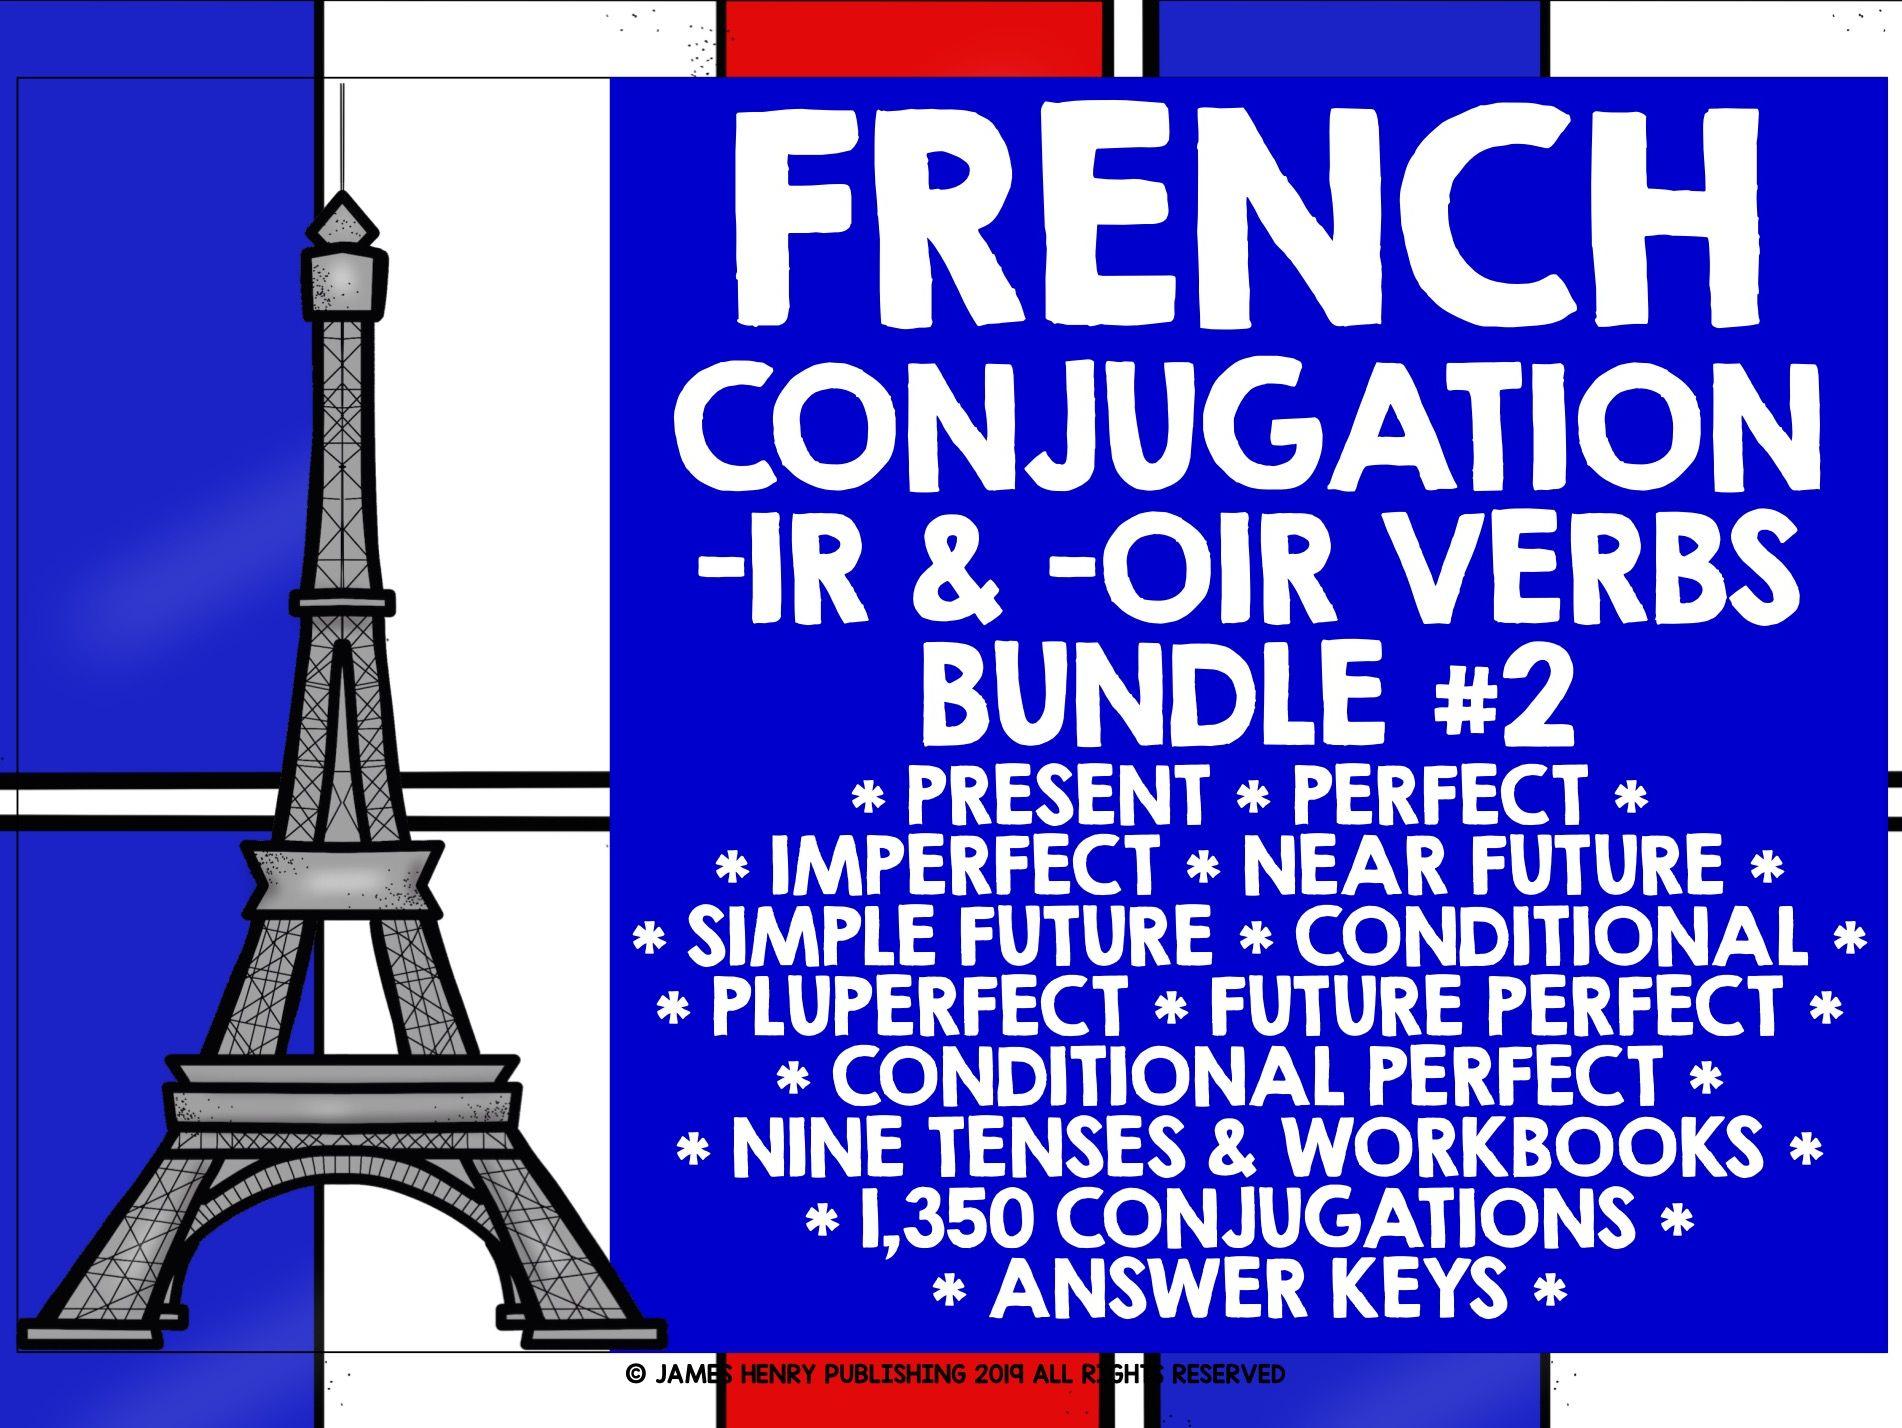 FRENCH -IR VERBS CONJUGATION BUNDLE #2